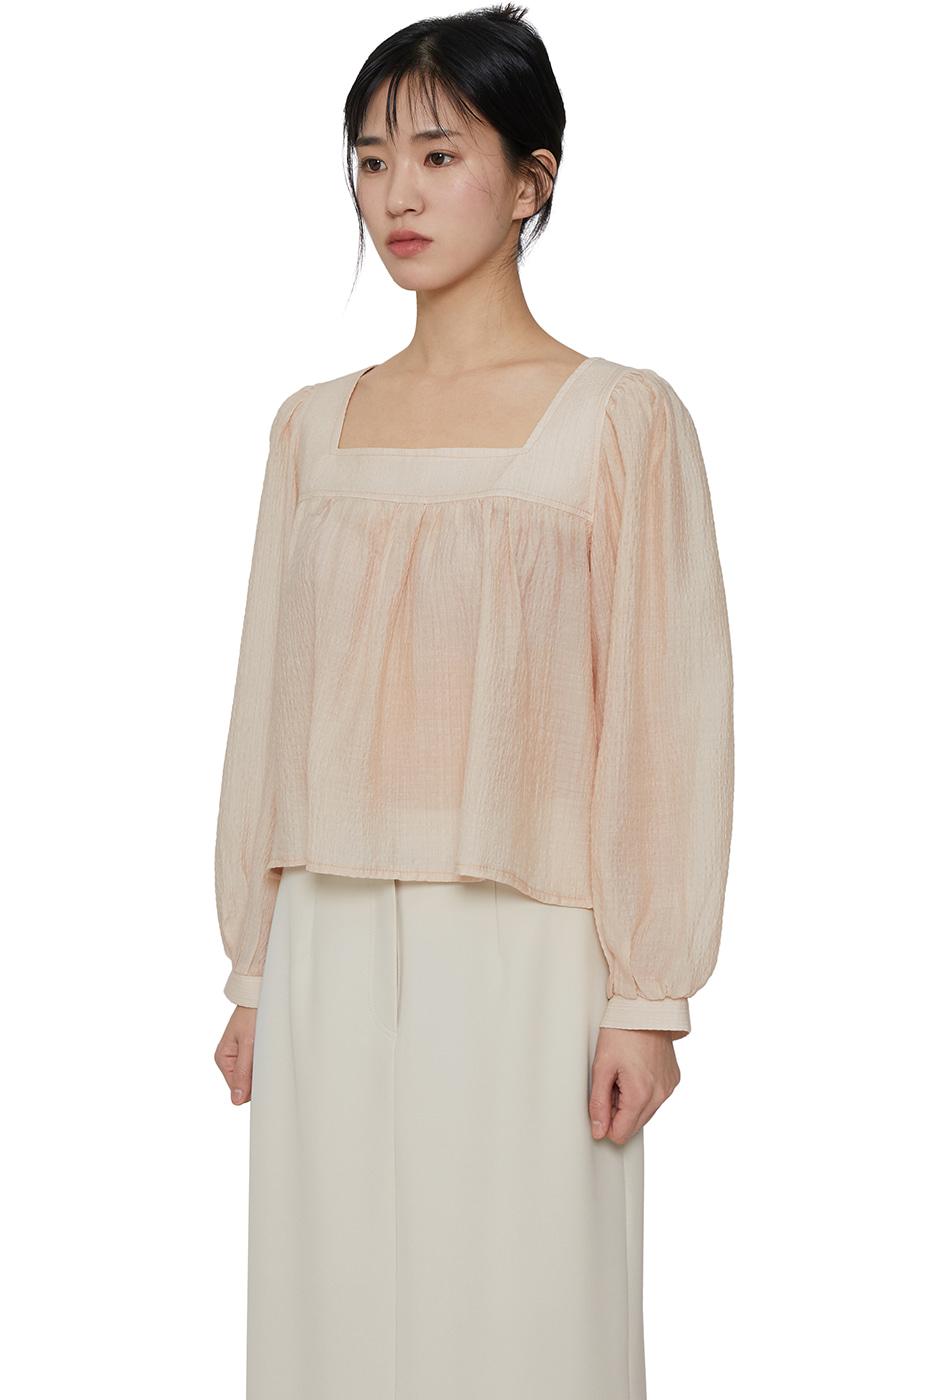 Sugar balloon blouse